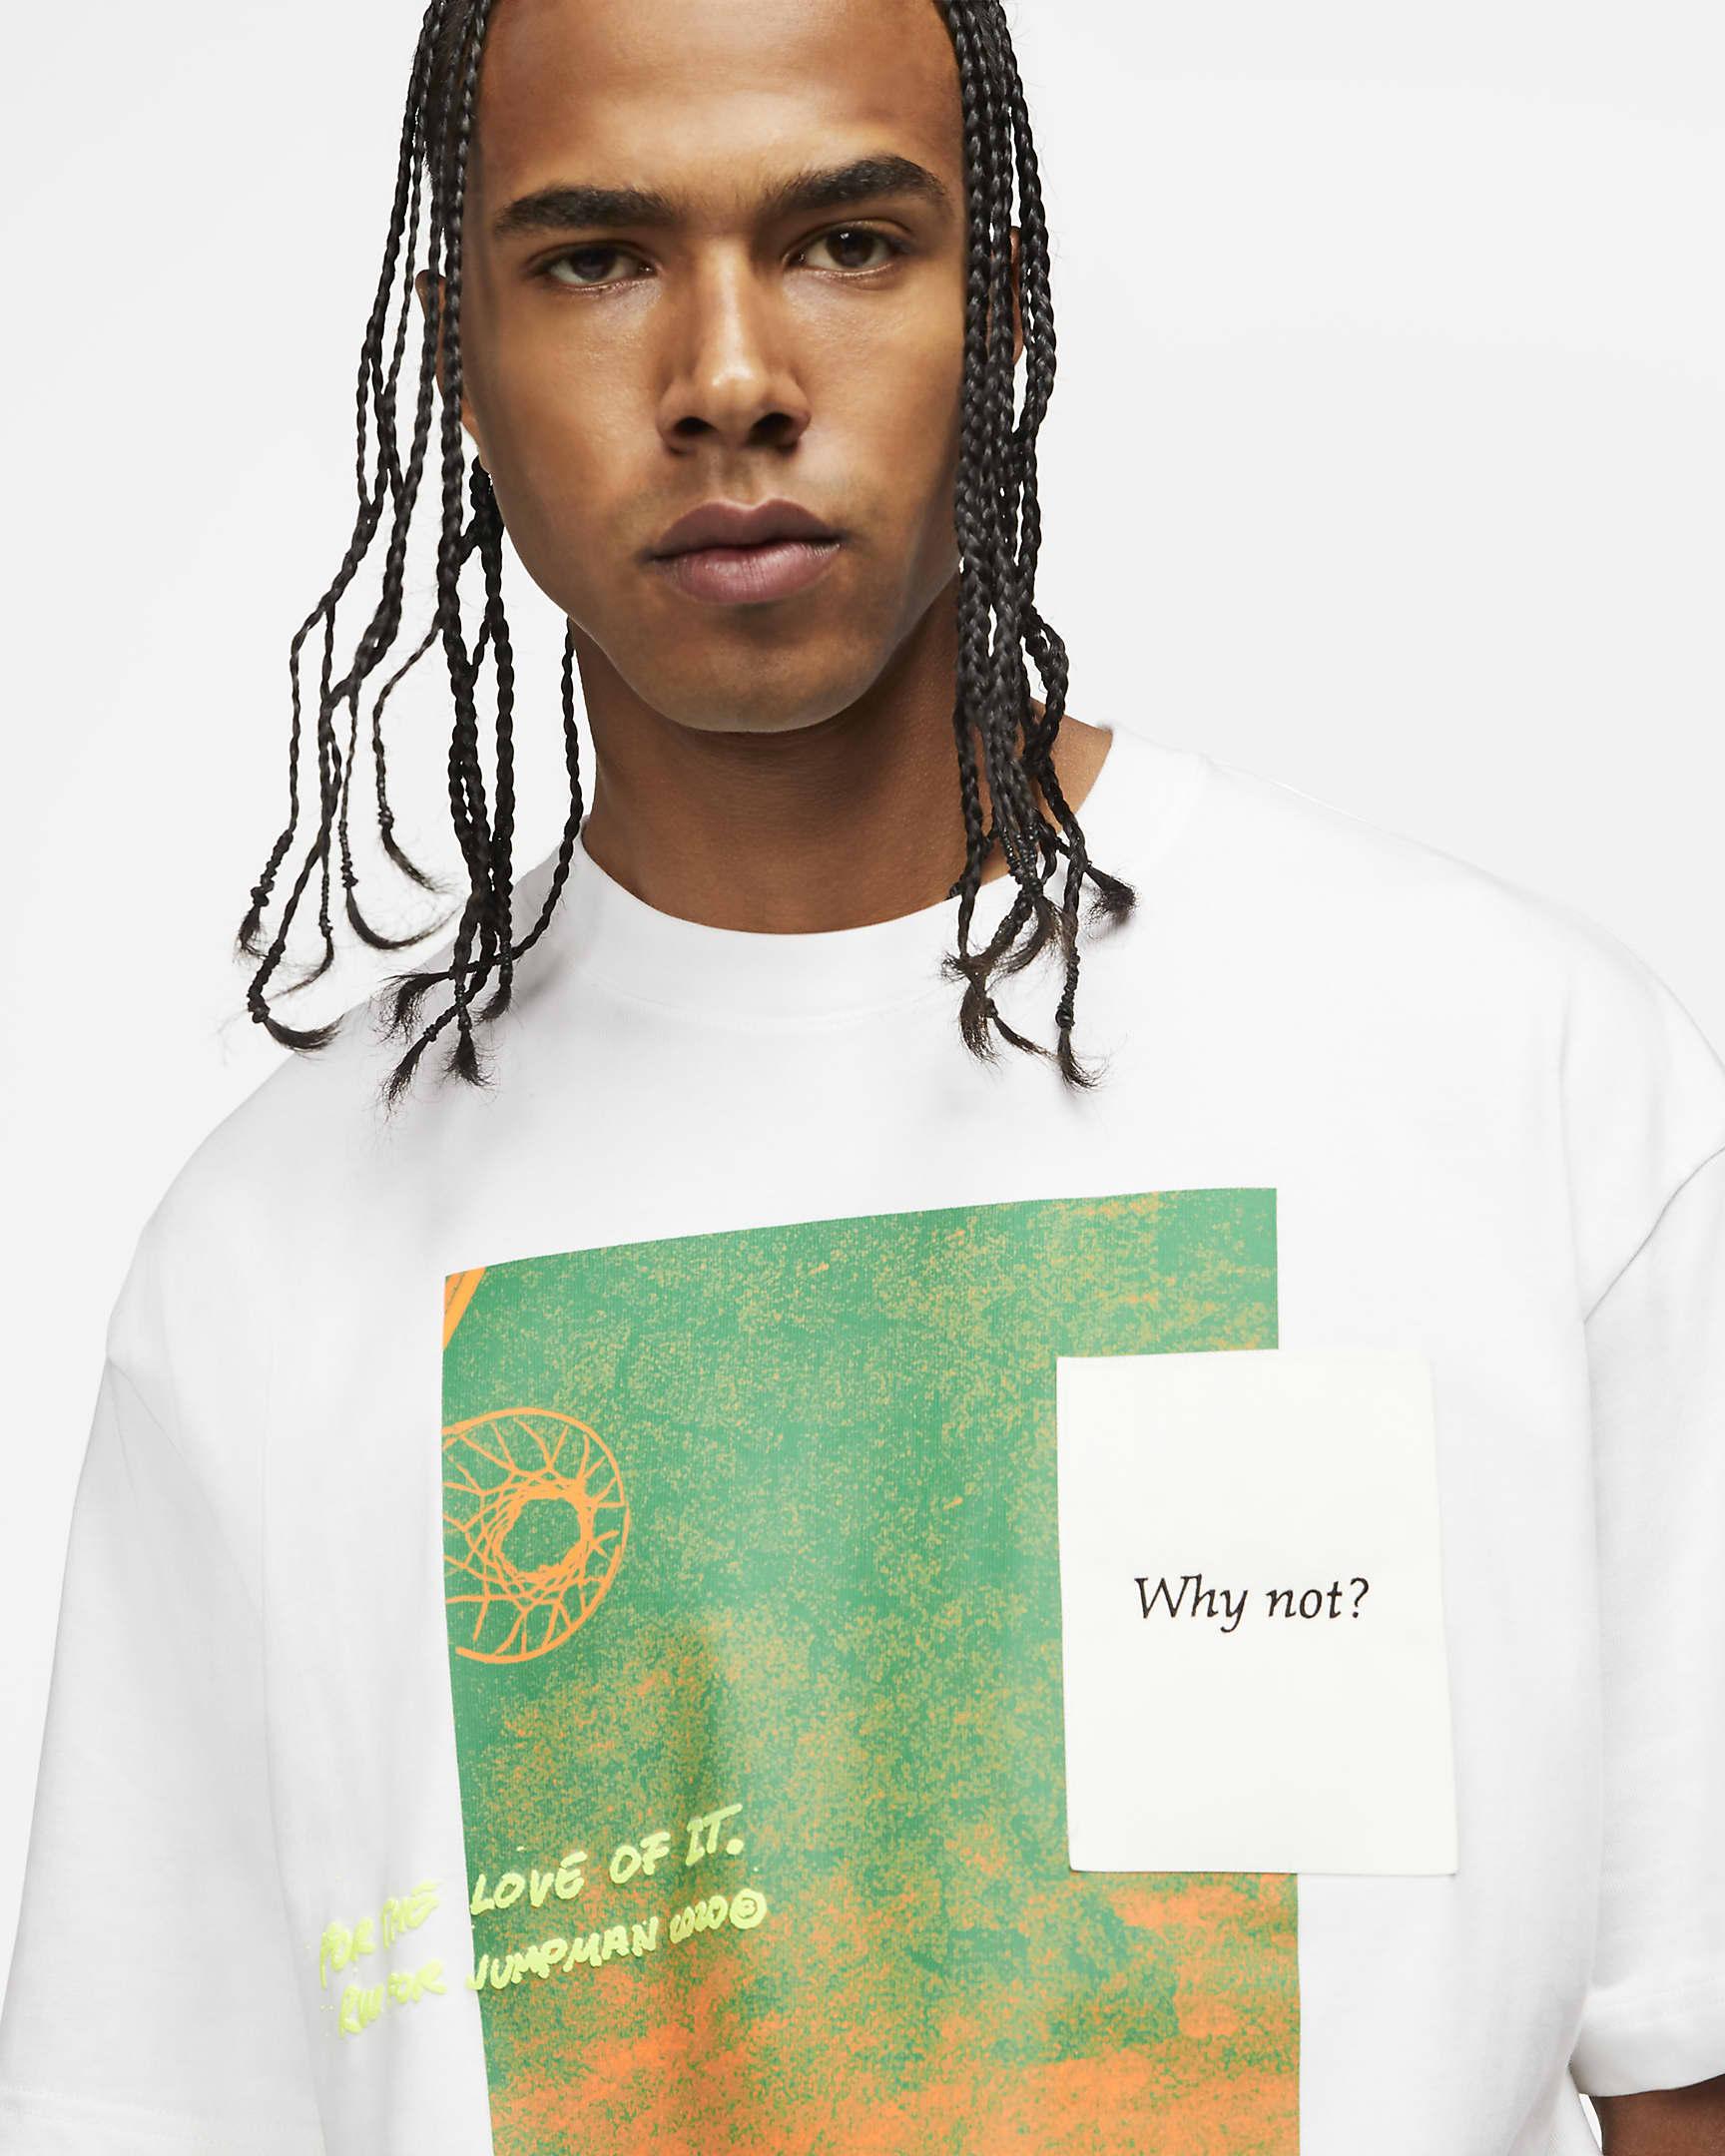 jordan-why-not-mens-short-sleeve-t-shirt-sw10WD-2